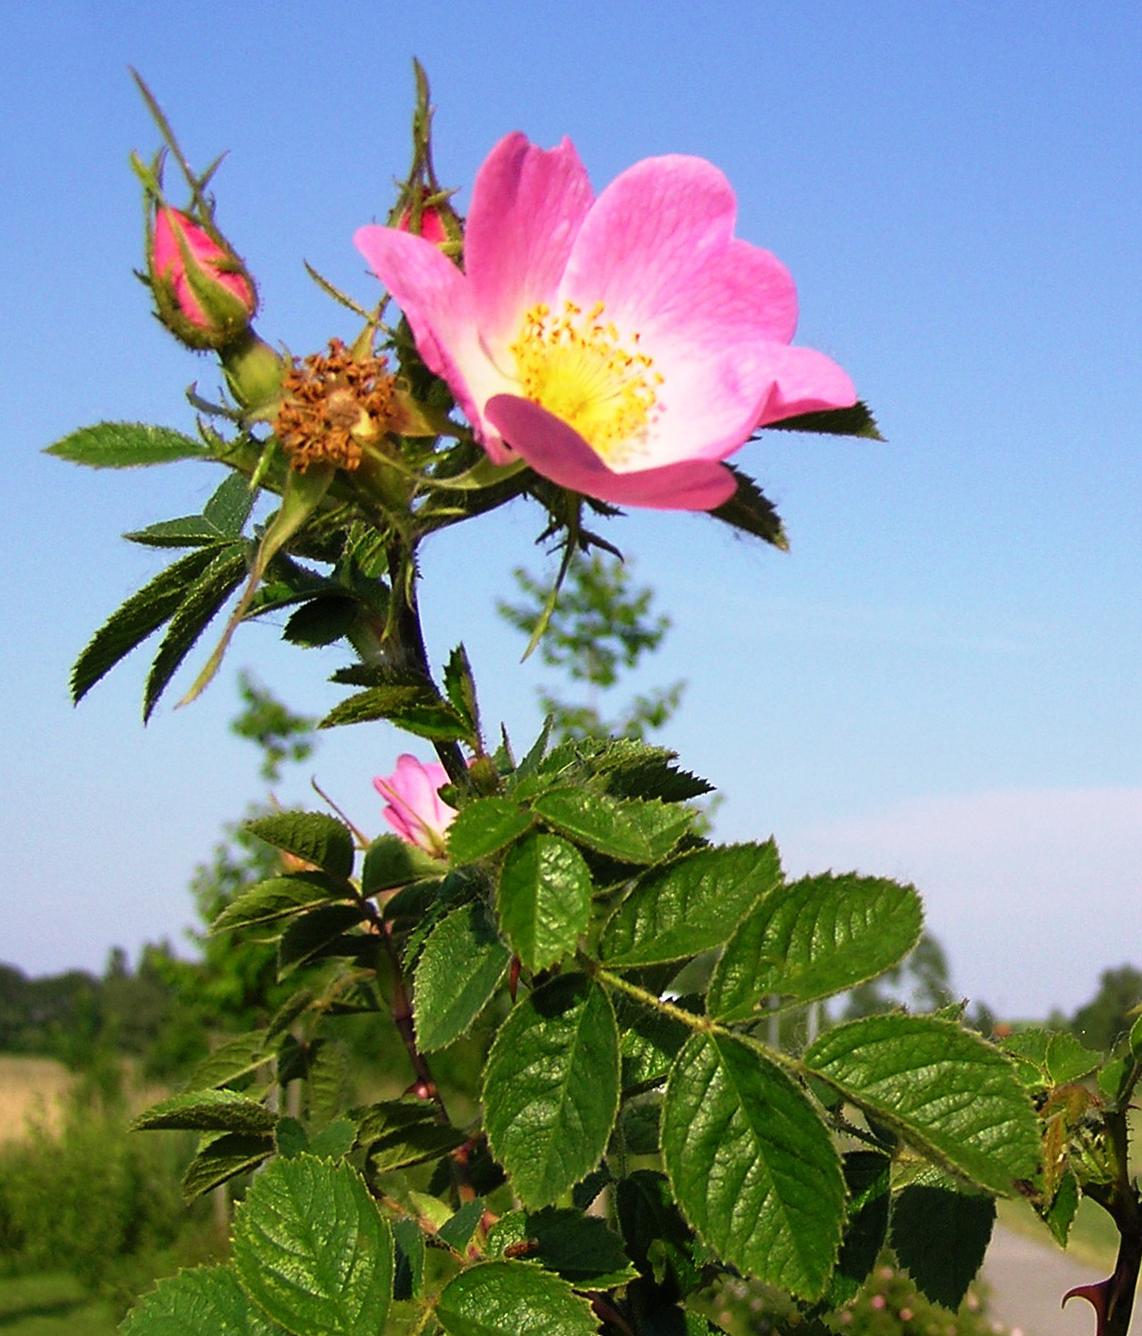 Rosa rubiginosa wikipedia for Rosa pianta